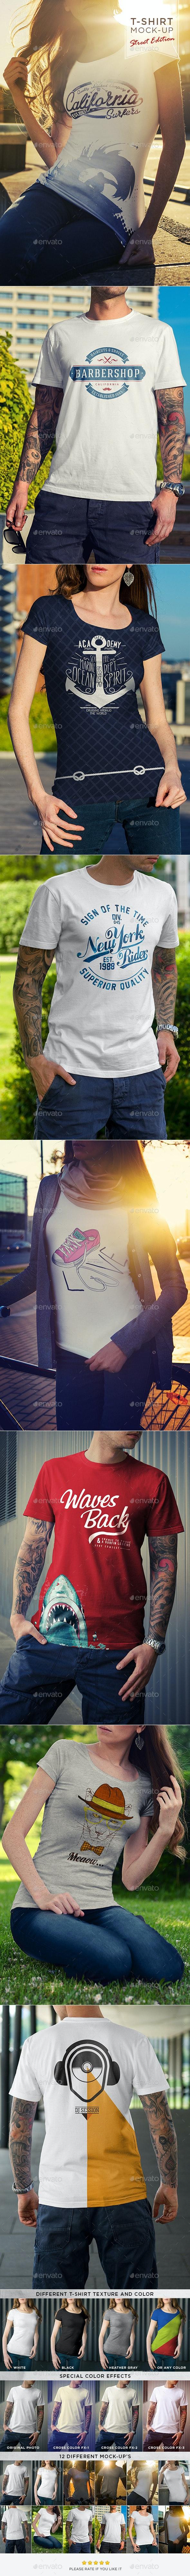 T-Shirt Mock-Up / Street Edition - T-shirts Apparel